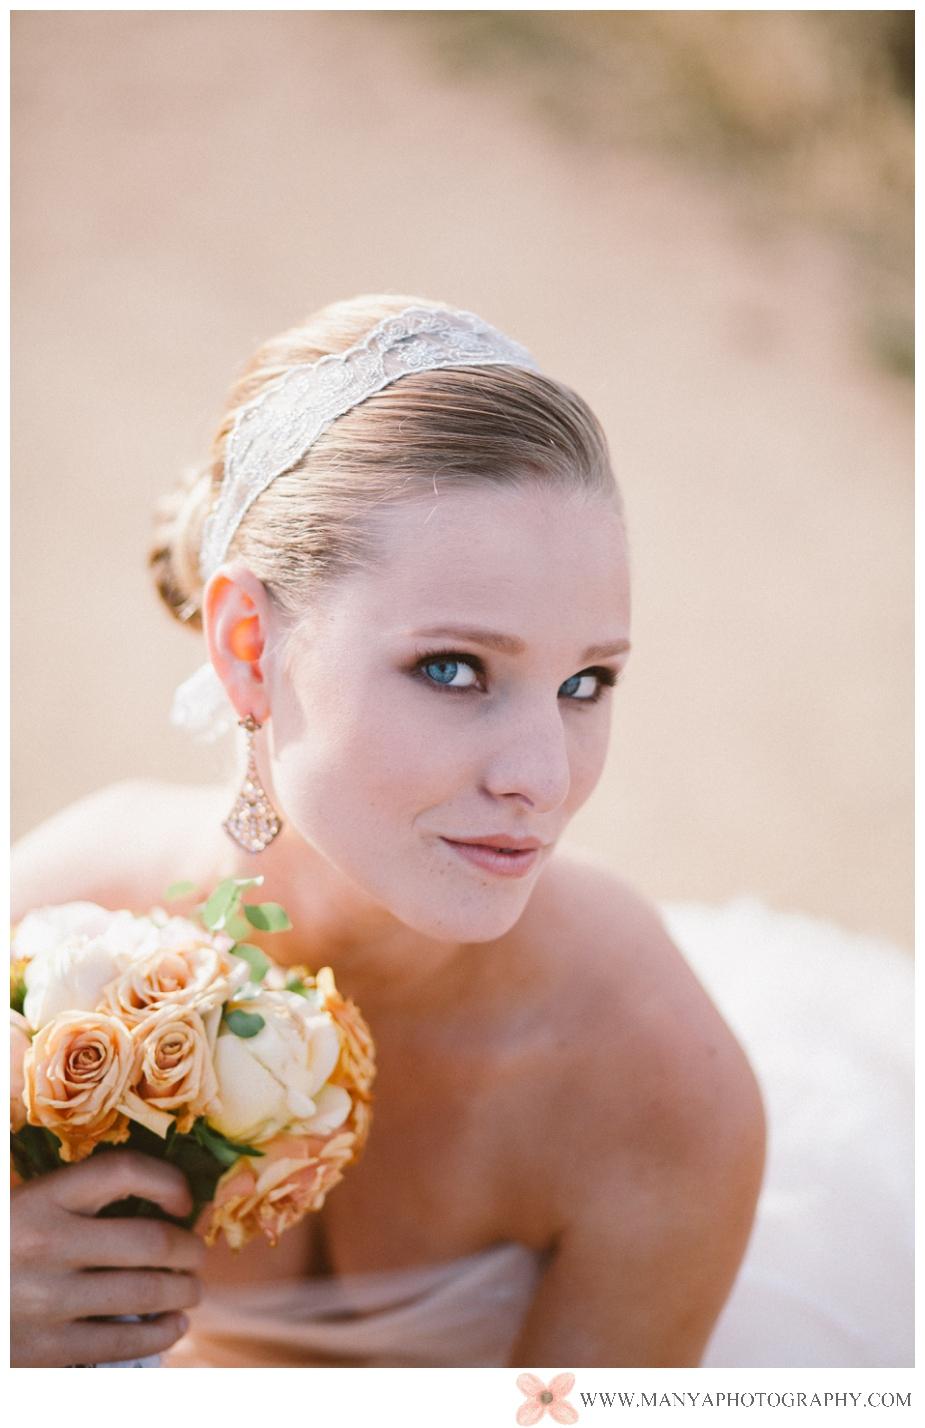 2013-07-24_0018 - Orange County Wedding Photographer